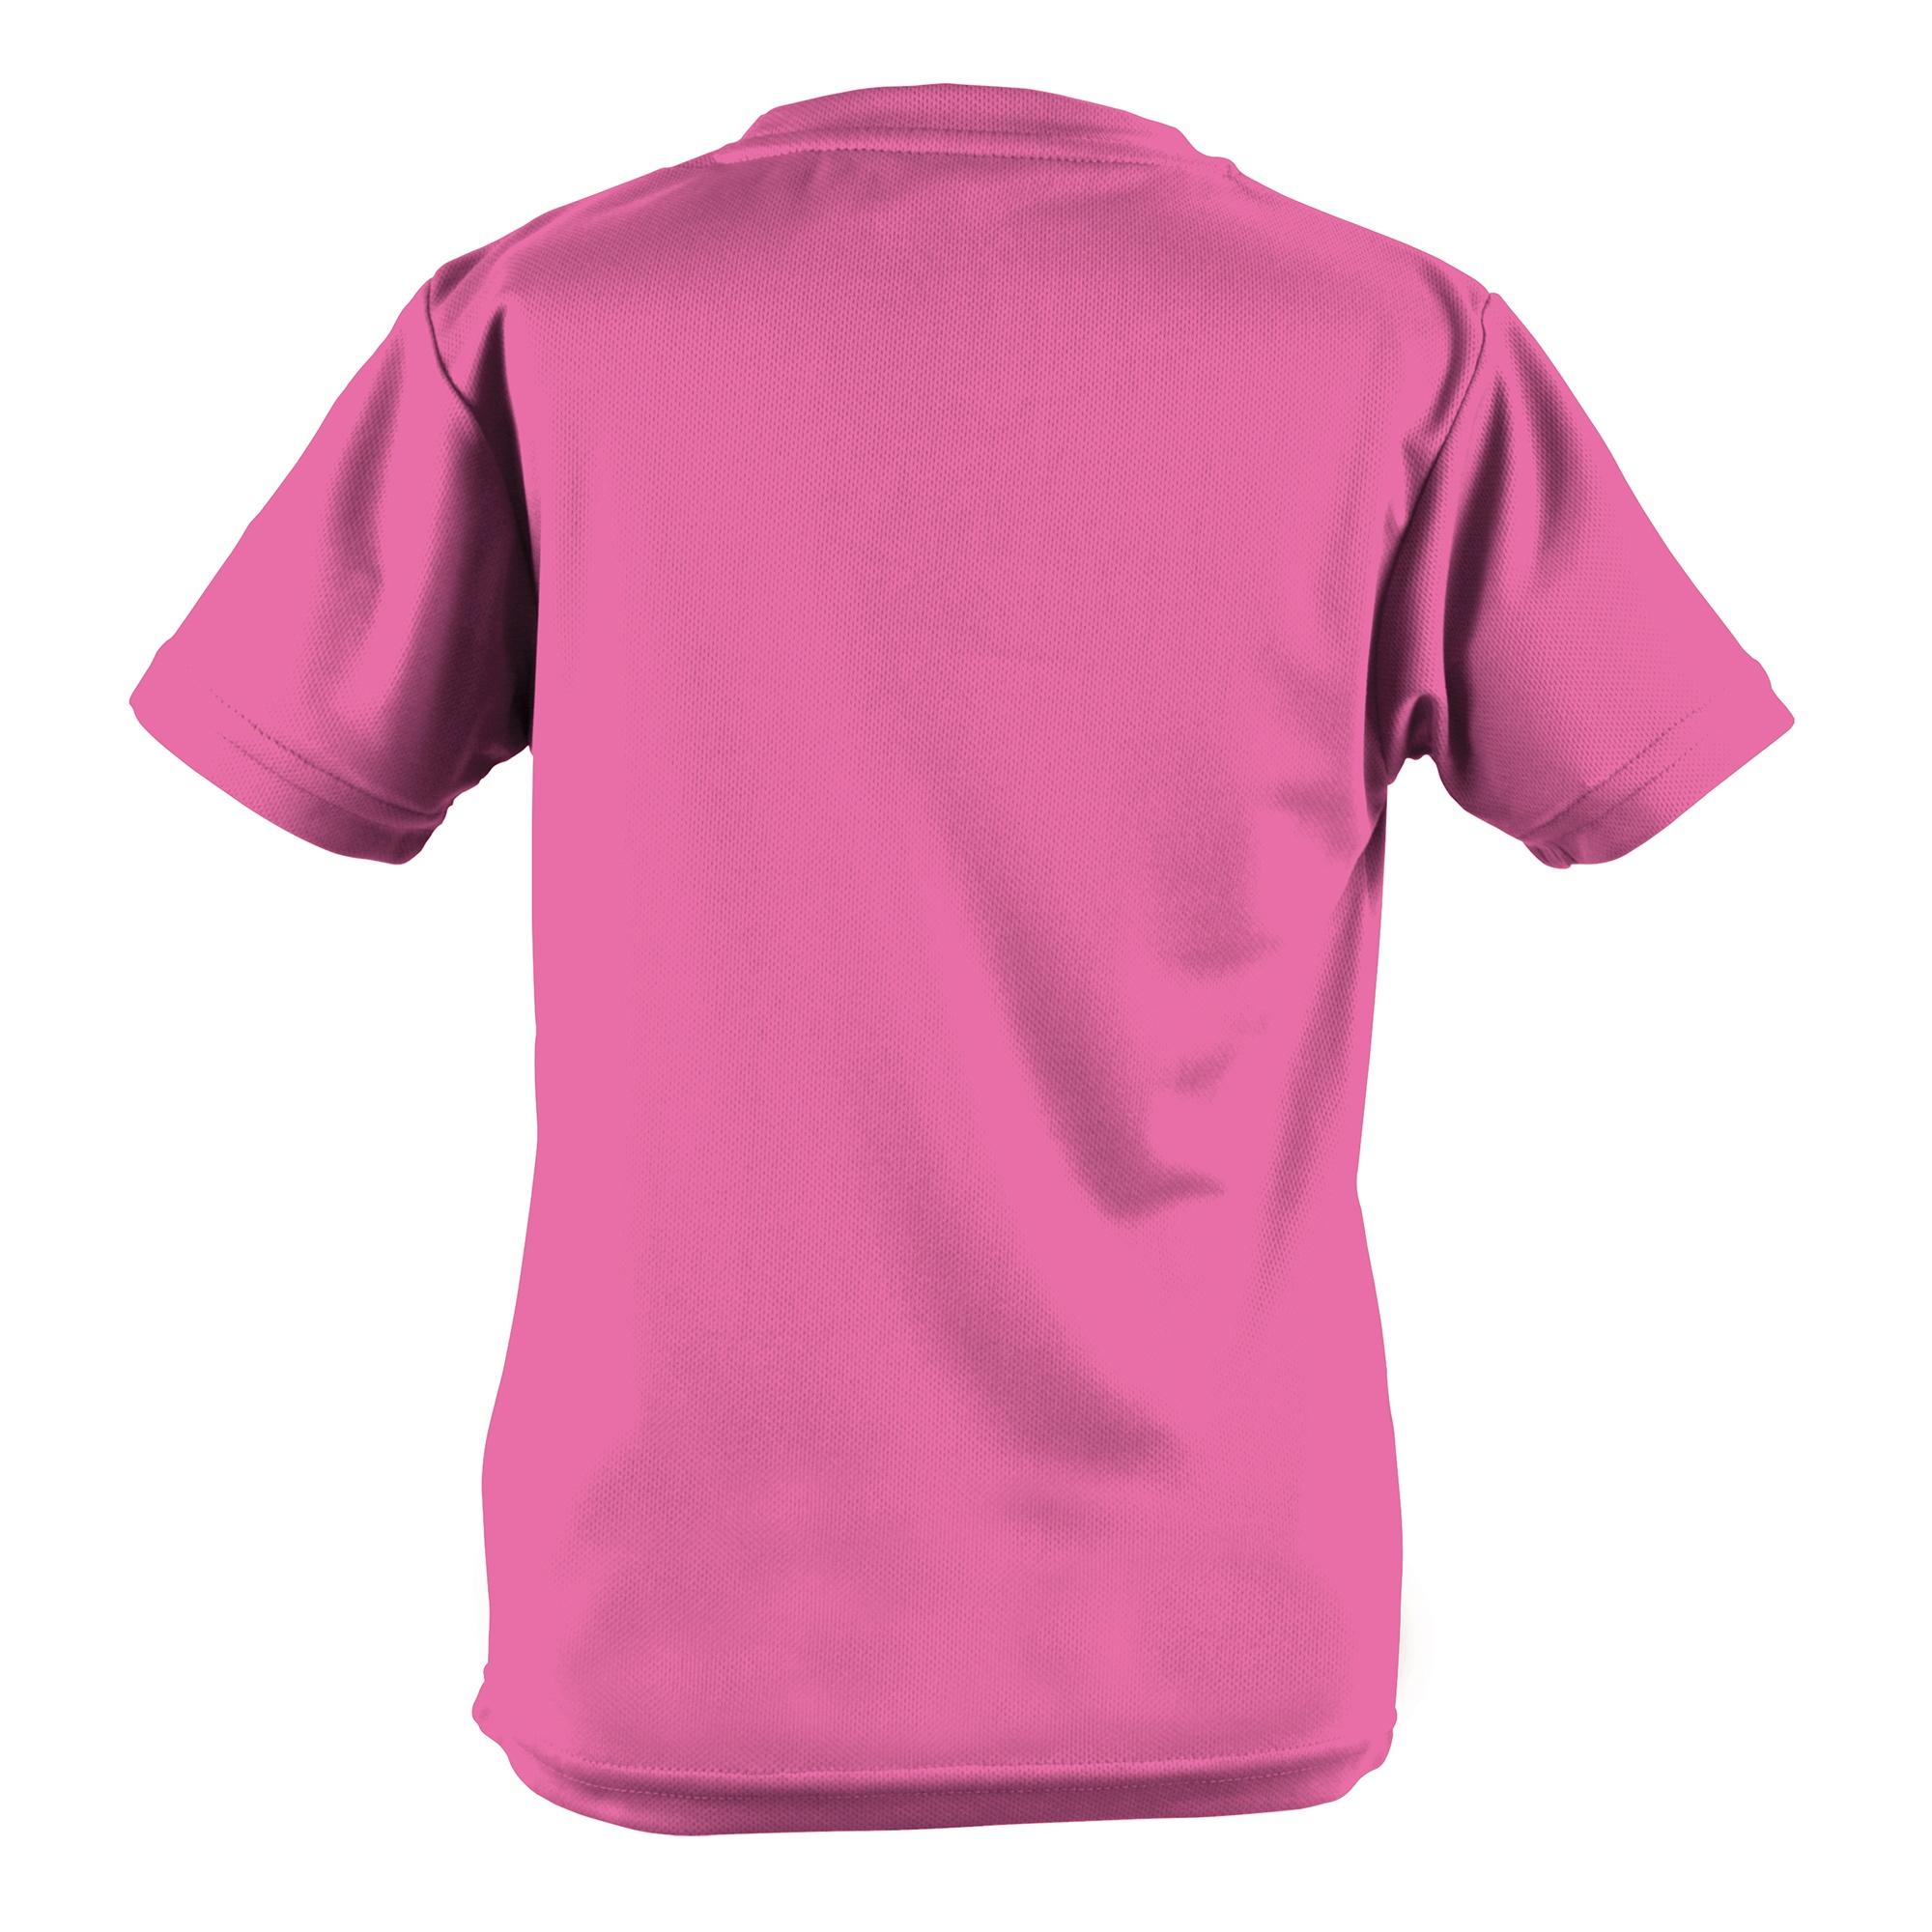 Just Cool Kids Unisex Sports T-Shirt | eBay